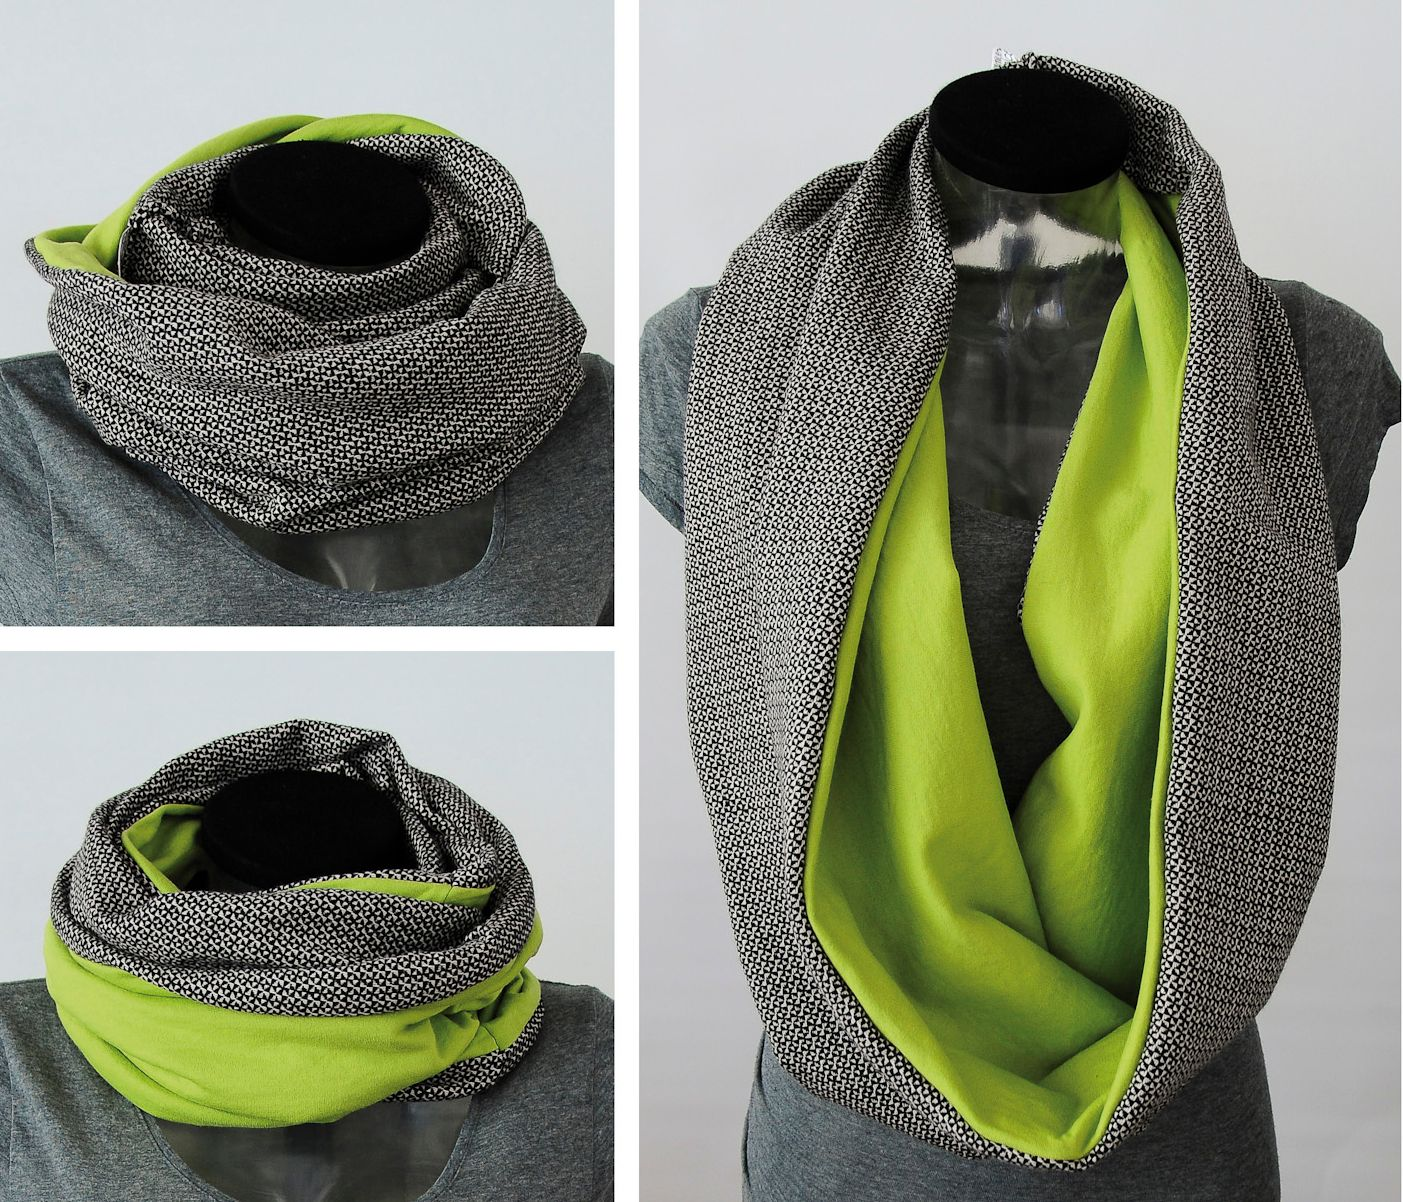 Scarf idea to make myself crafty ideas pinterest scarves scarf idea to make myself solutioingenieria Images